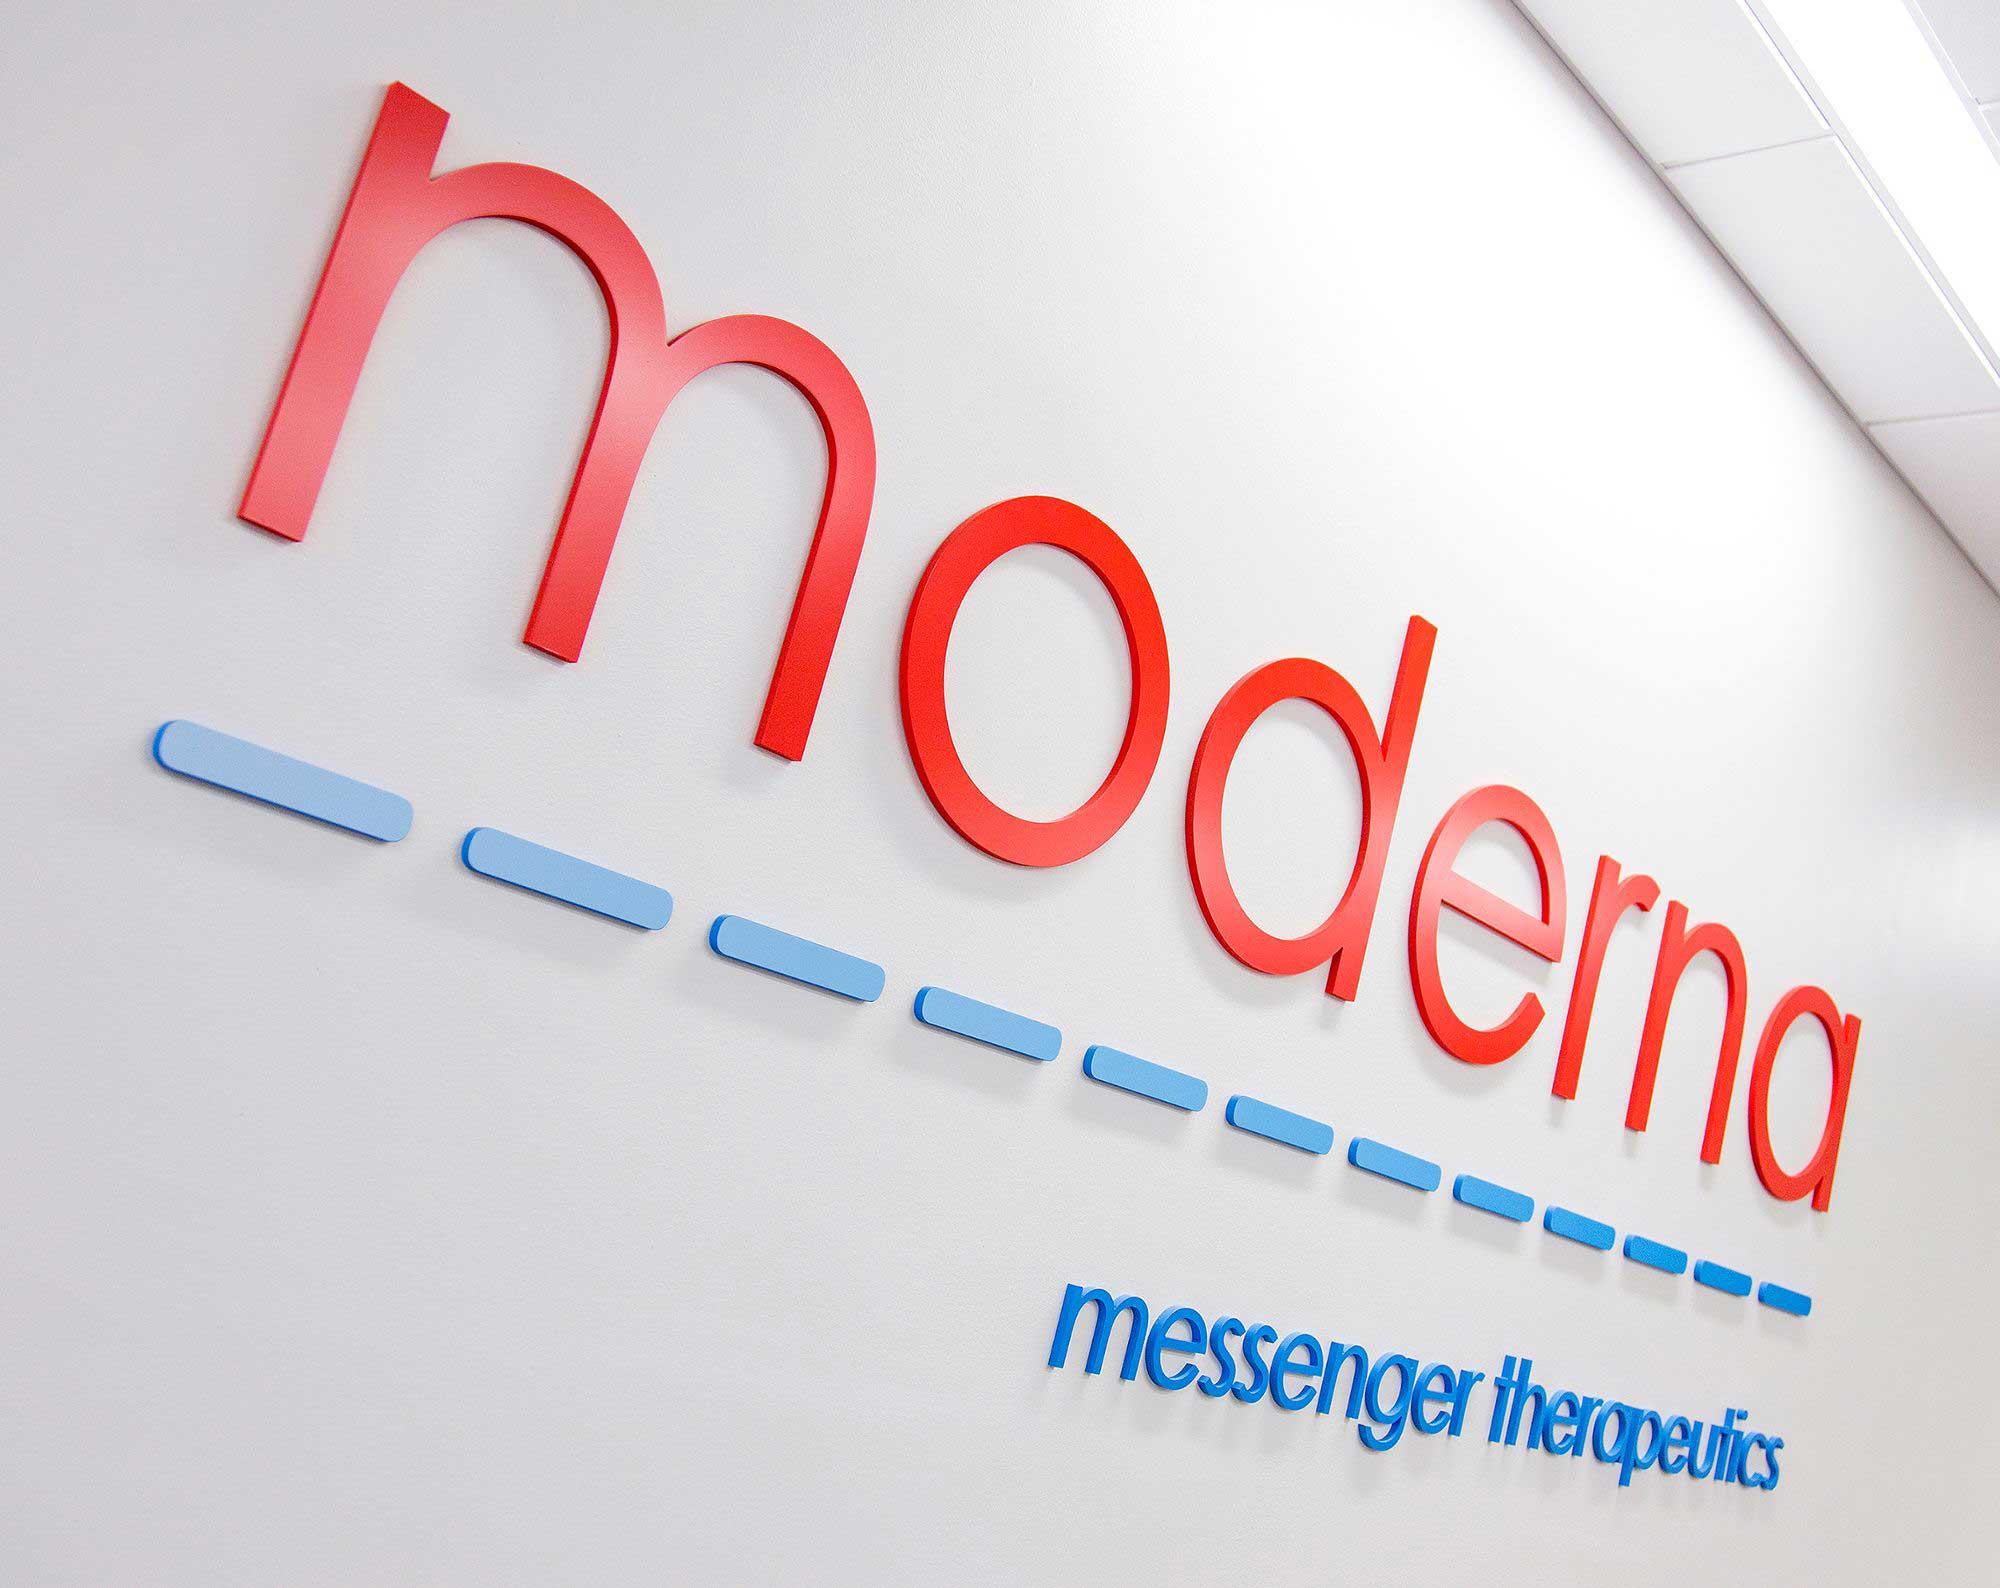 «Модерна терапьютикс» (Moderna Therapeutics).